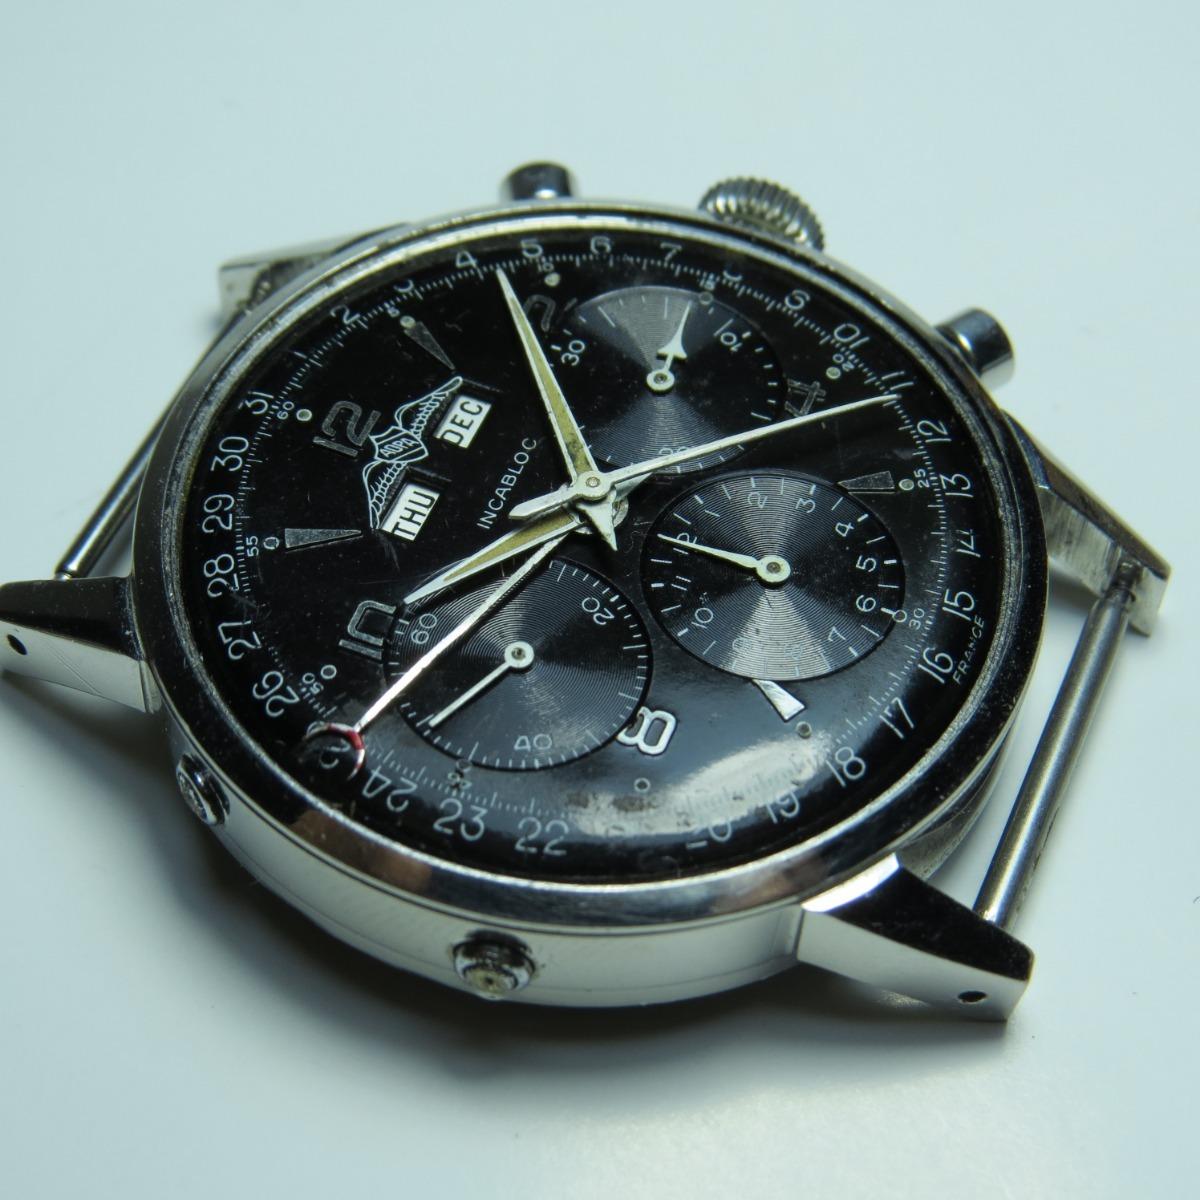 e2f686f5b62 Relógio Breitling Wakmann Valjoux 72 Militar Crono Pilot Aço - R ...